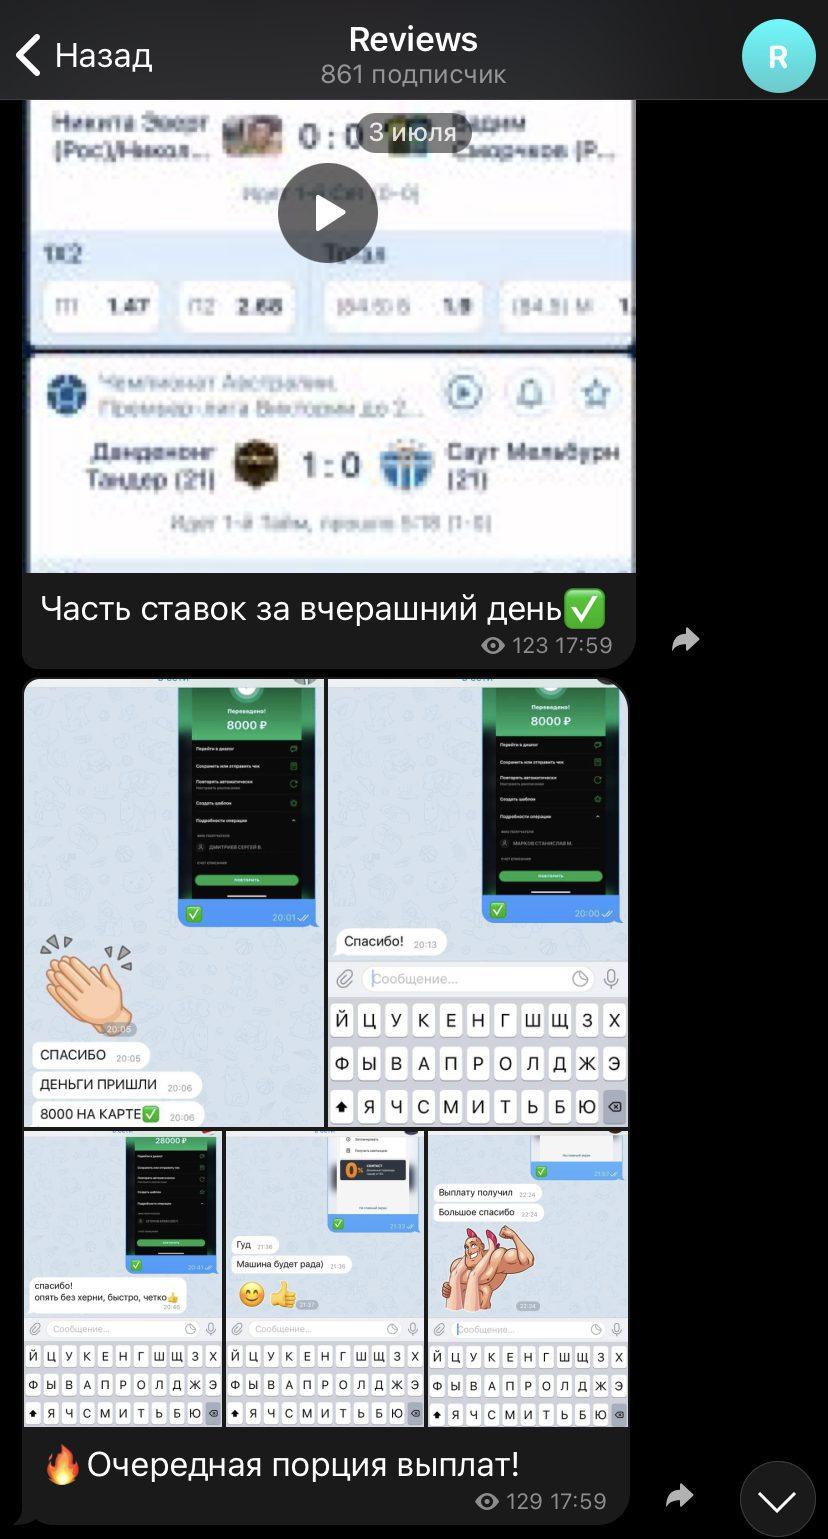 tiggo bot телеграмм отзывы